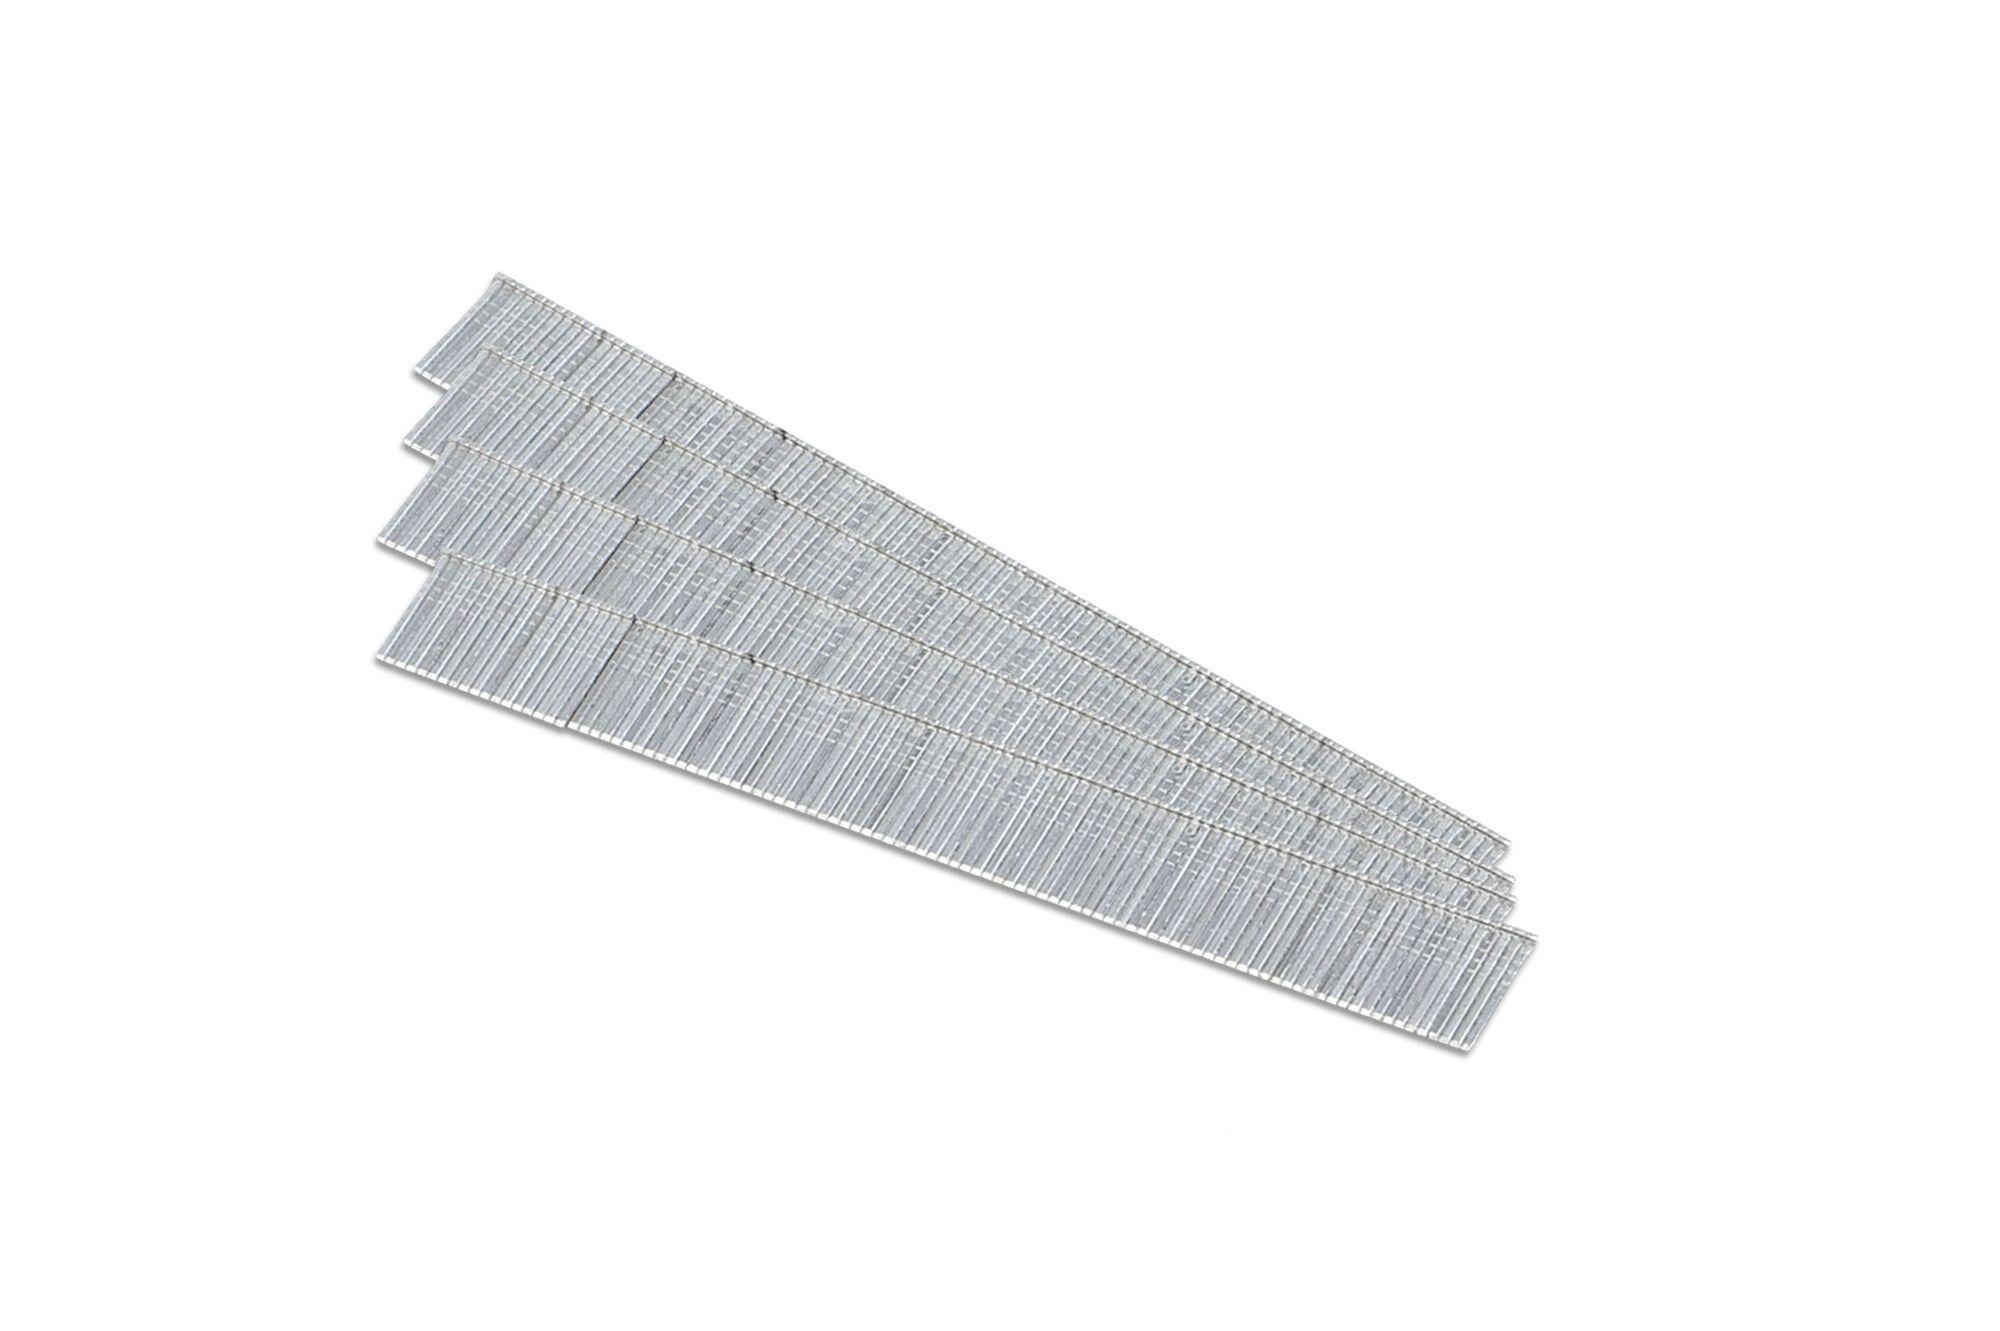 1500 Spijkers voor nagelapparaat Powerplus POWAIR0311 | Stalen nagels 50 mm